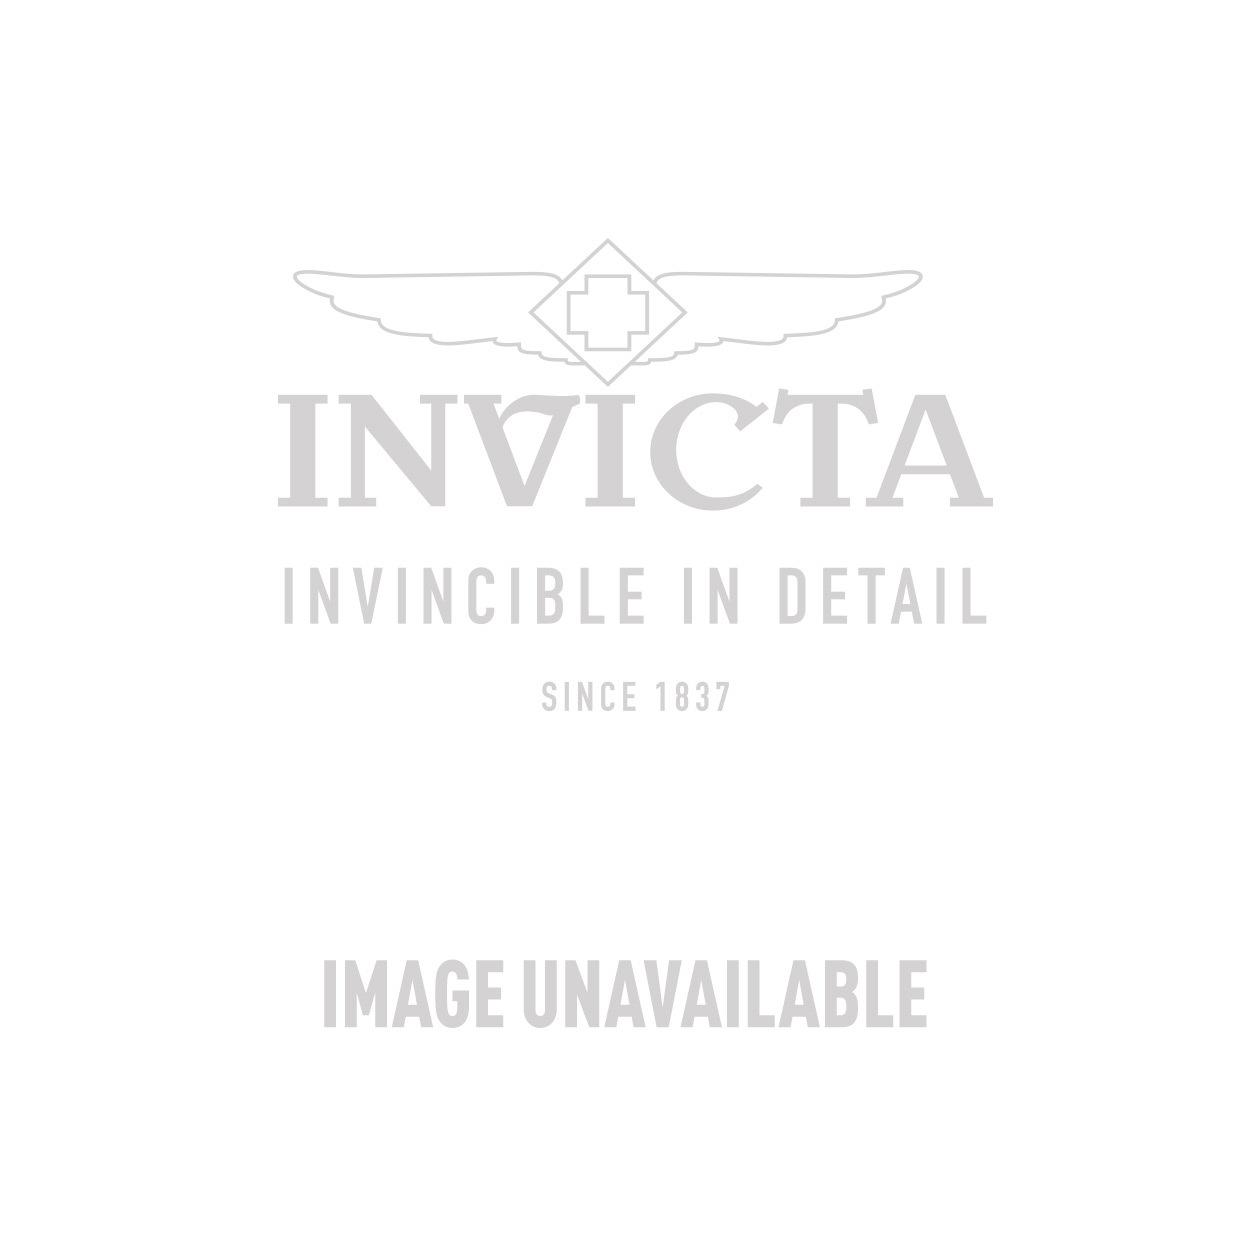 Invicta Corduba Quartz Watch - Gold case with Gold, Black tone Stainless Steel, Polyurethane band - Model 4899